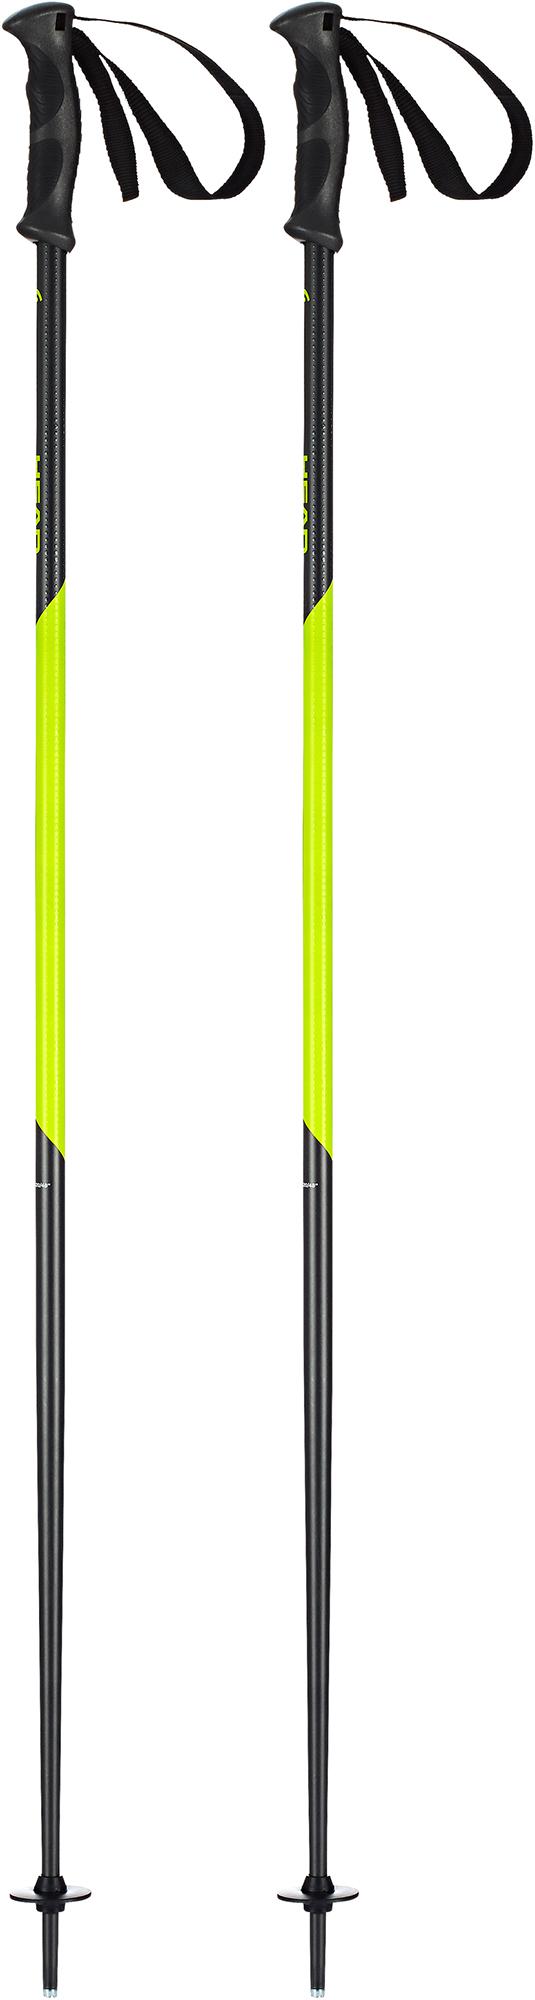 Head Палки горнолыжные Head Multi, размер 135 head палки горнолыжные head worldcup размер 135